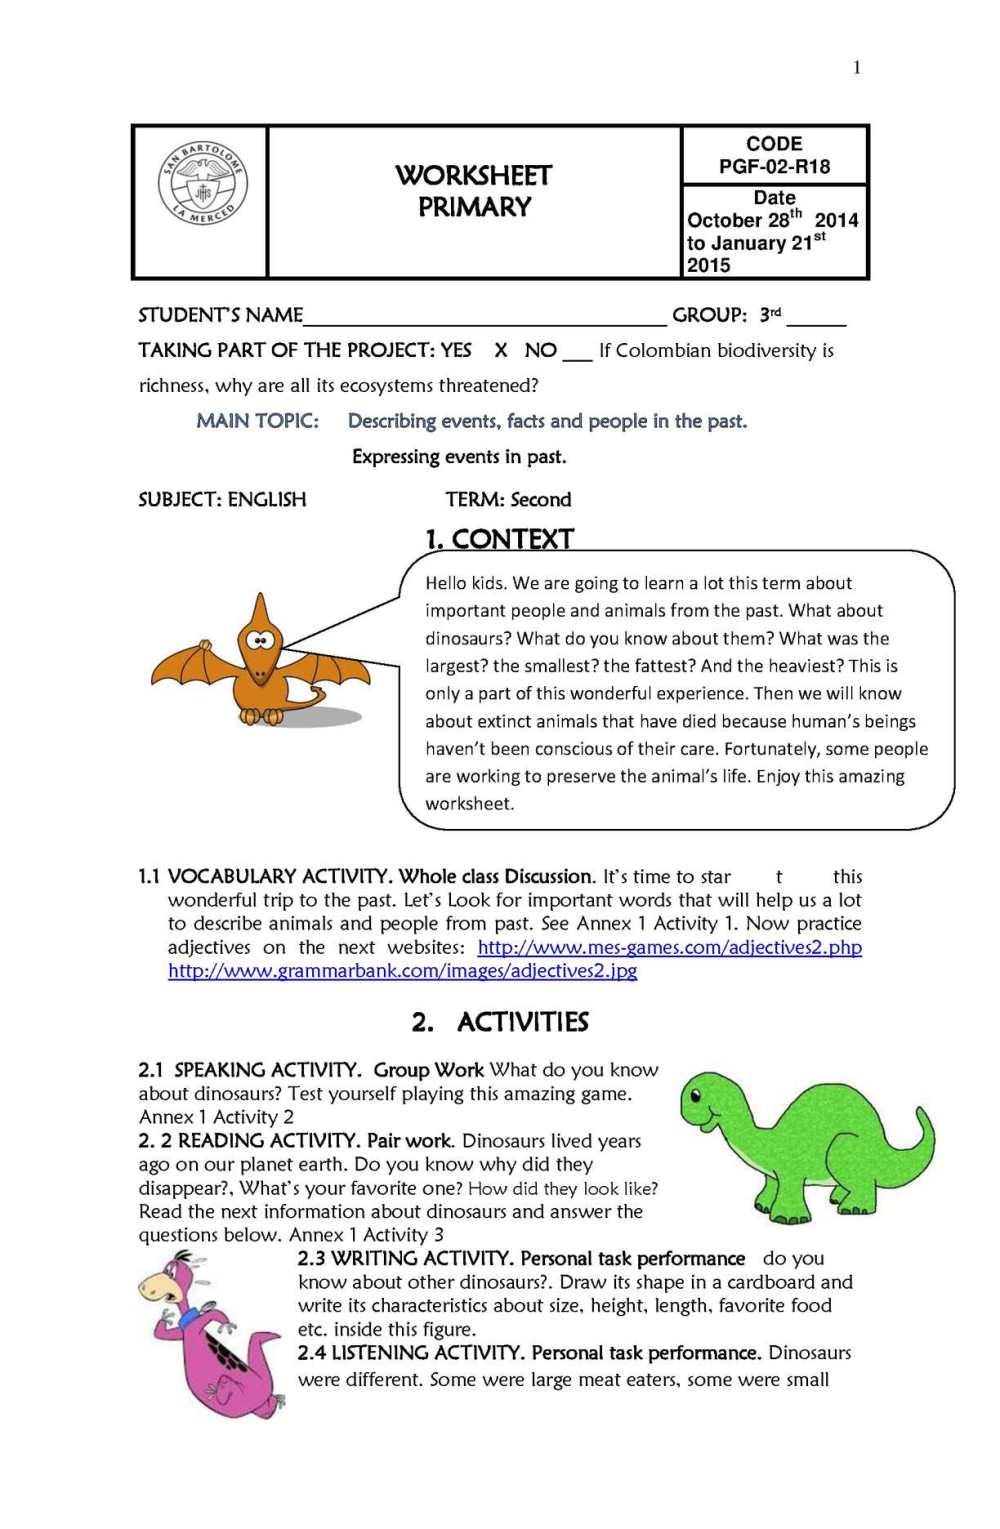 medium resolution of Calaméo - Worksheet Third Grade Second Term